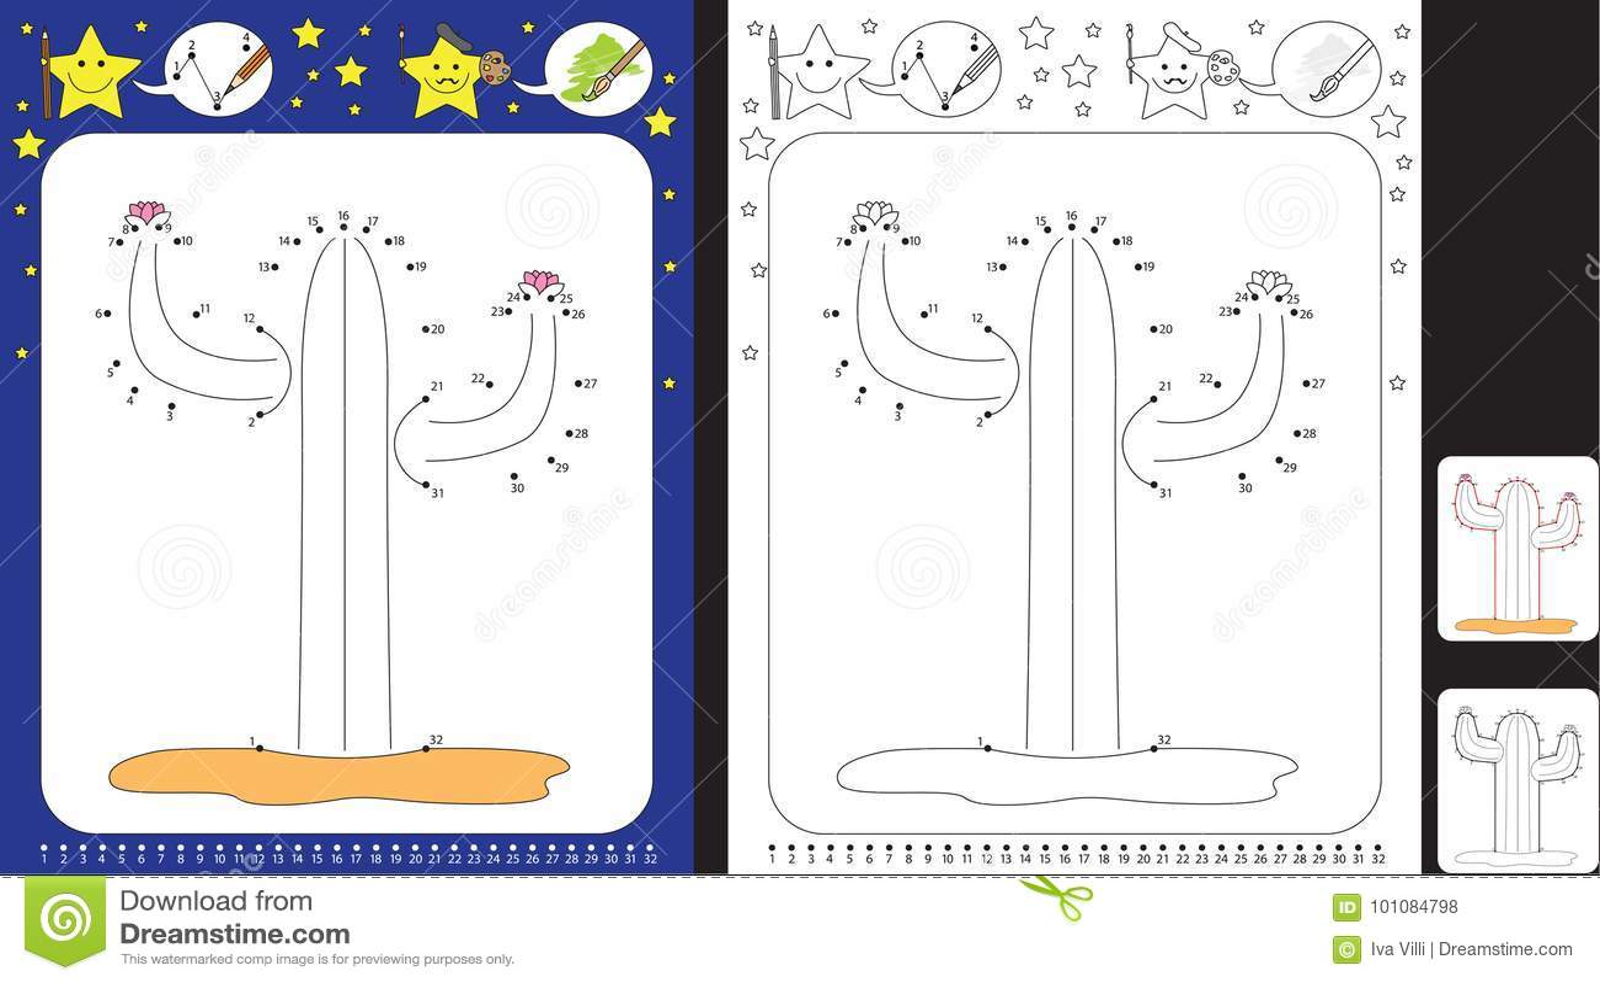 Preschool Worksheet Stock Vector Illustration Of Early